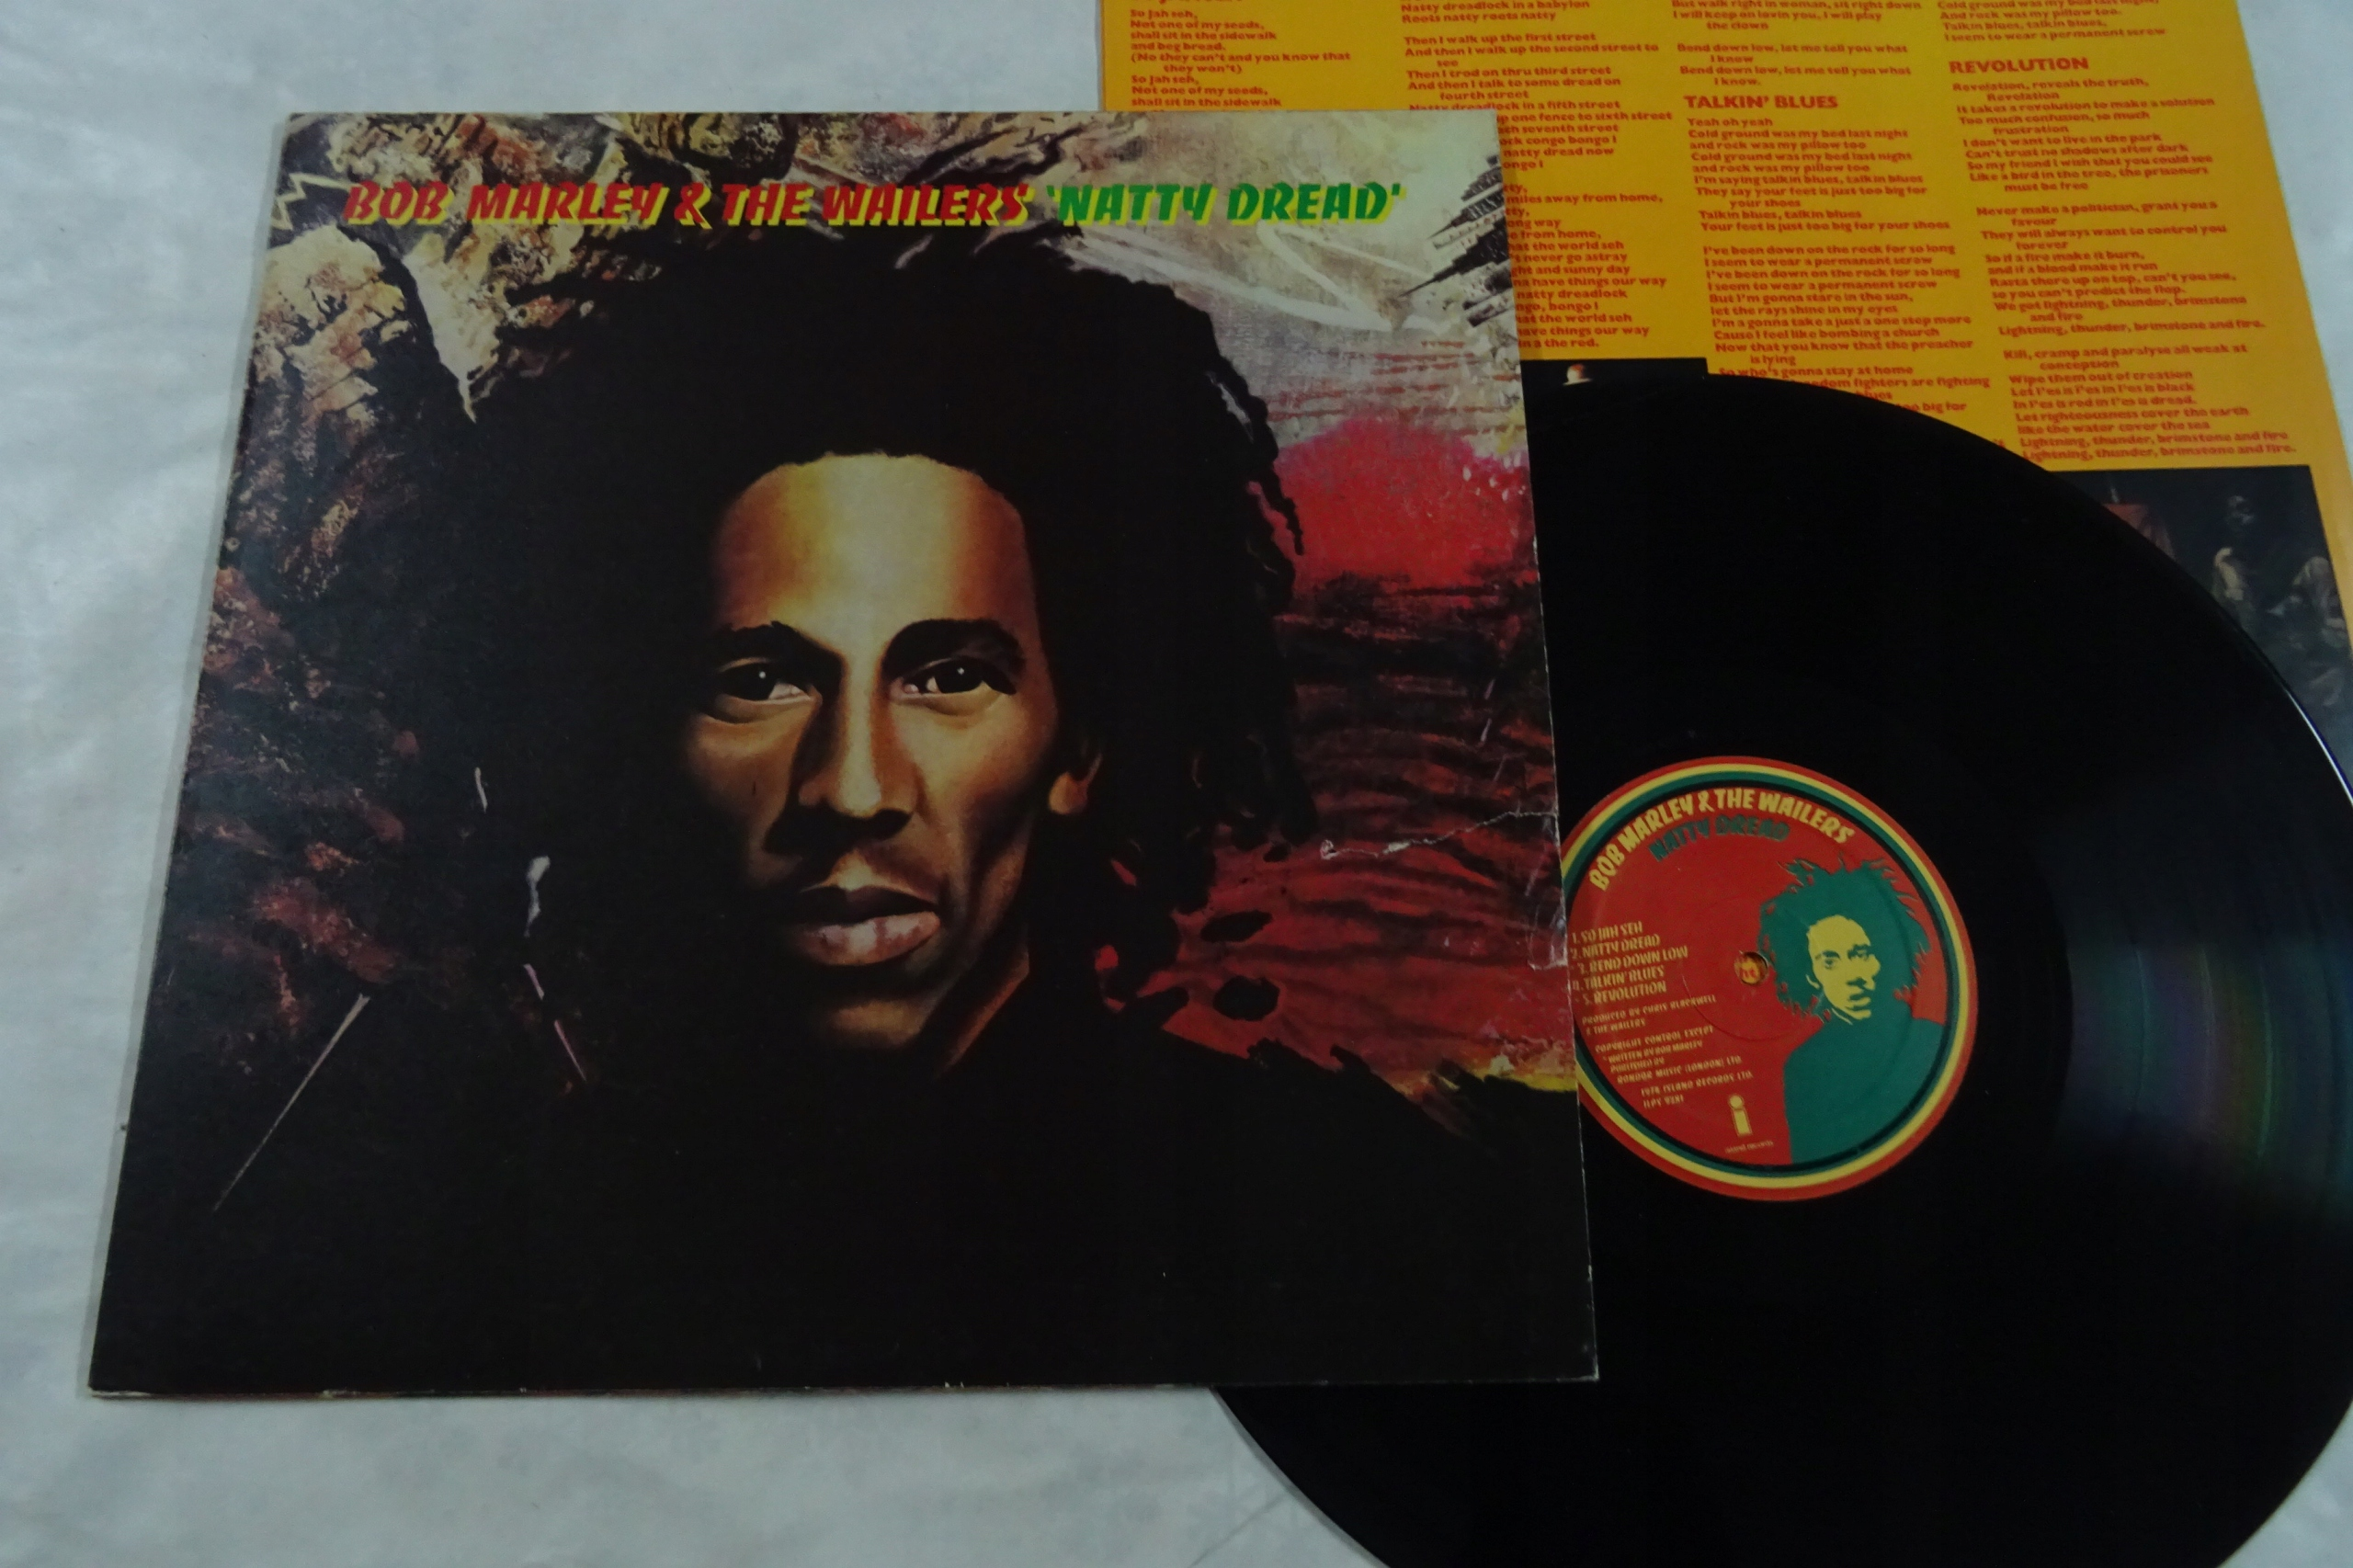 Bob Marley & The Wailers Natty Dread 257 UK